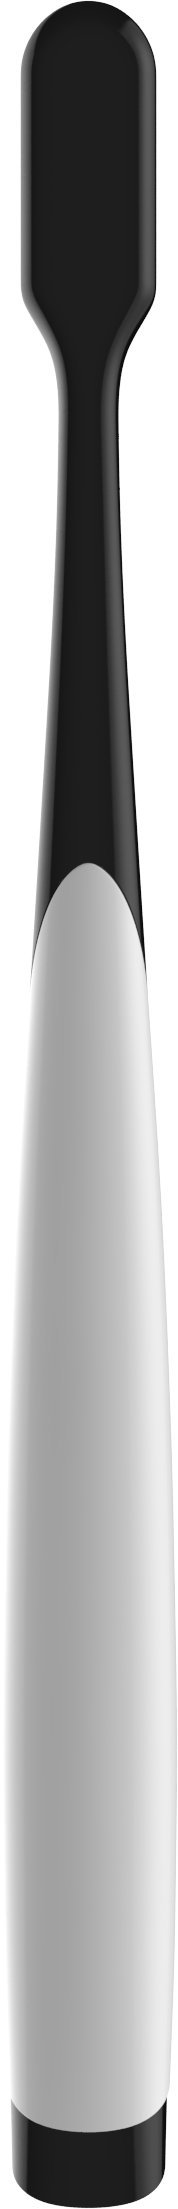 5 Pack Charcoal Toothbrush [GENTLE SOFT] Slim Teeth Head Whitening Brush for Adults & Children [FAMILY PACK] - Ultra Soft Medium Tip Bristles (WHITE)